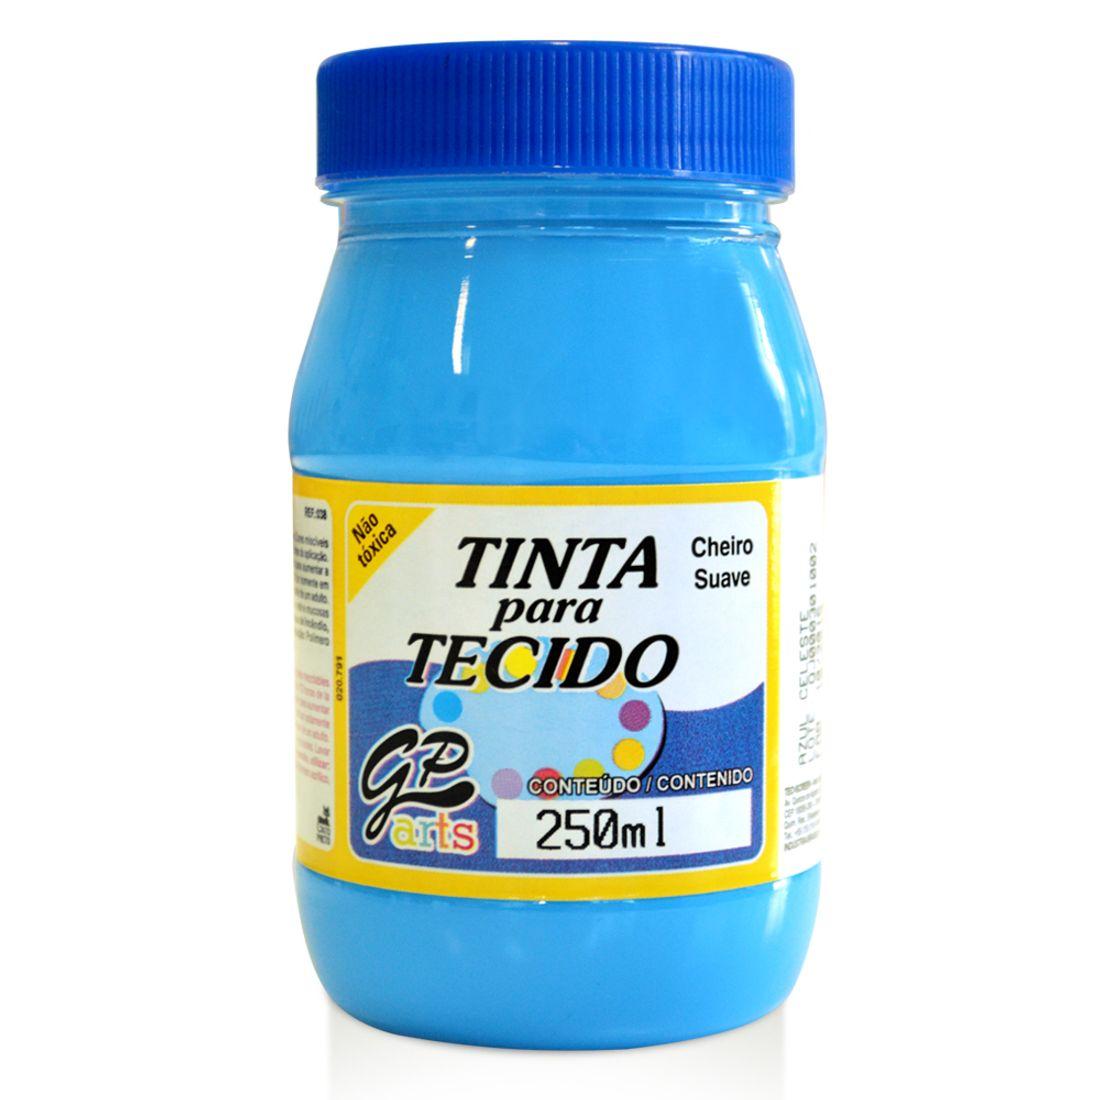 Tinta-para-Tecido-GP-Arts-250ml